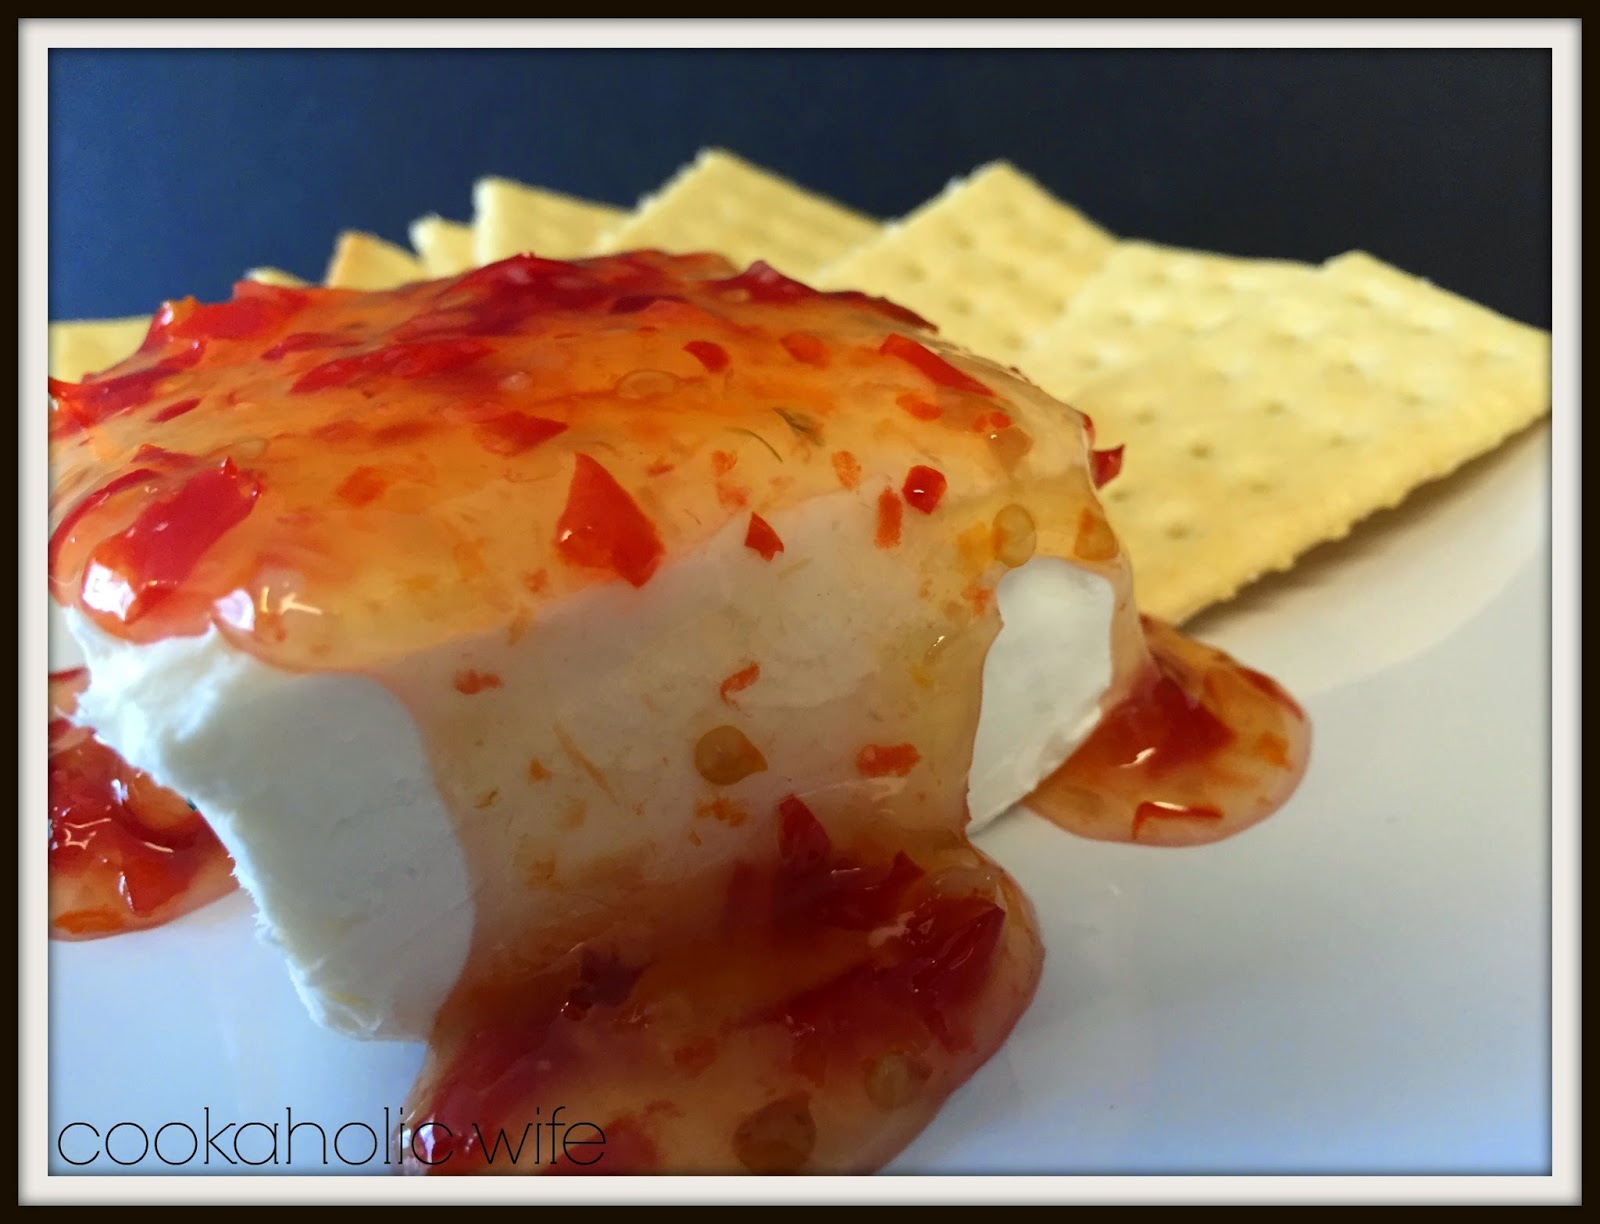 Sweet Chili Cream Cheese Dip Cookaholic Wife